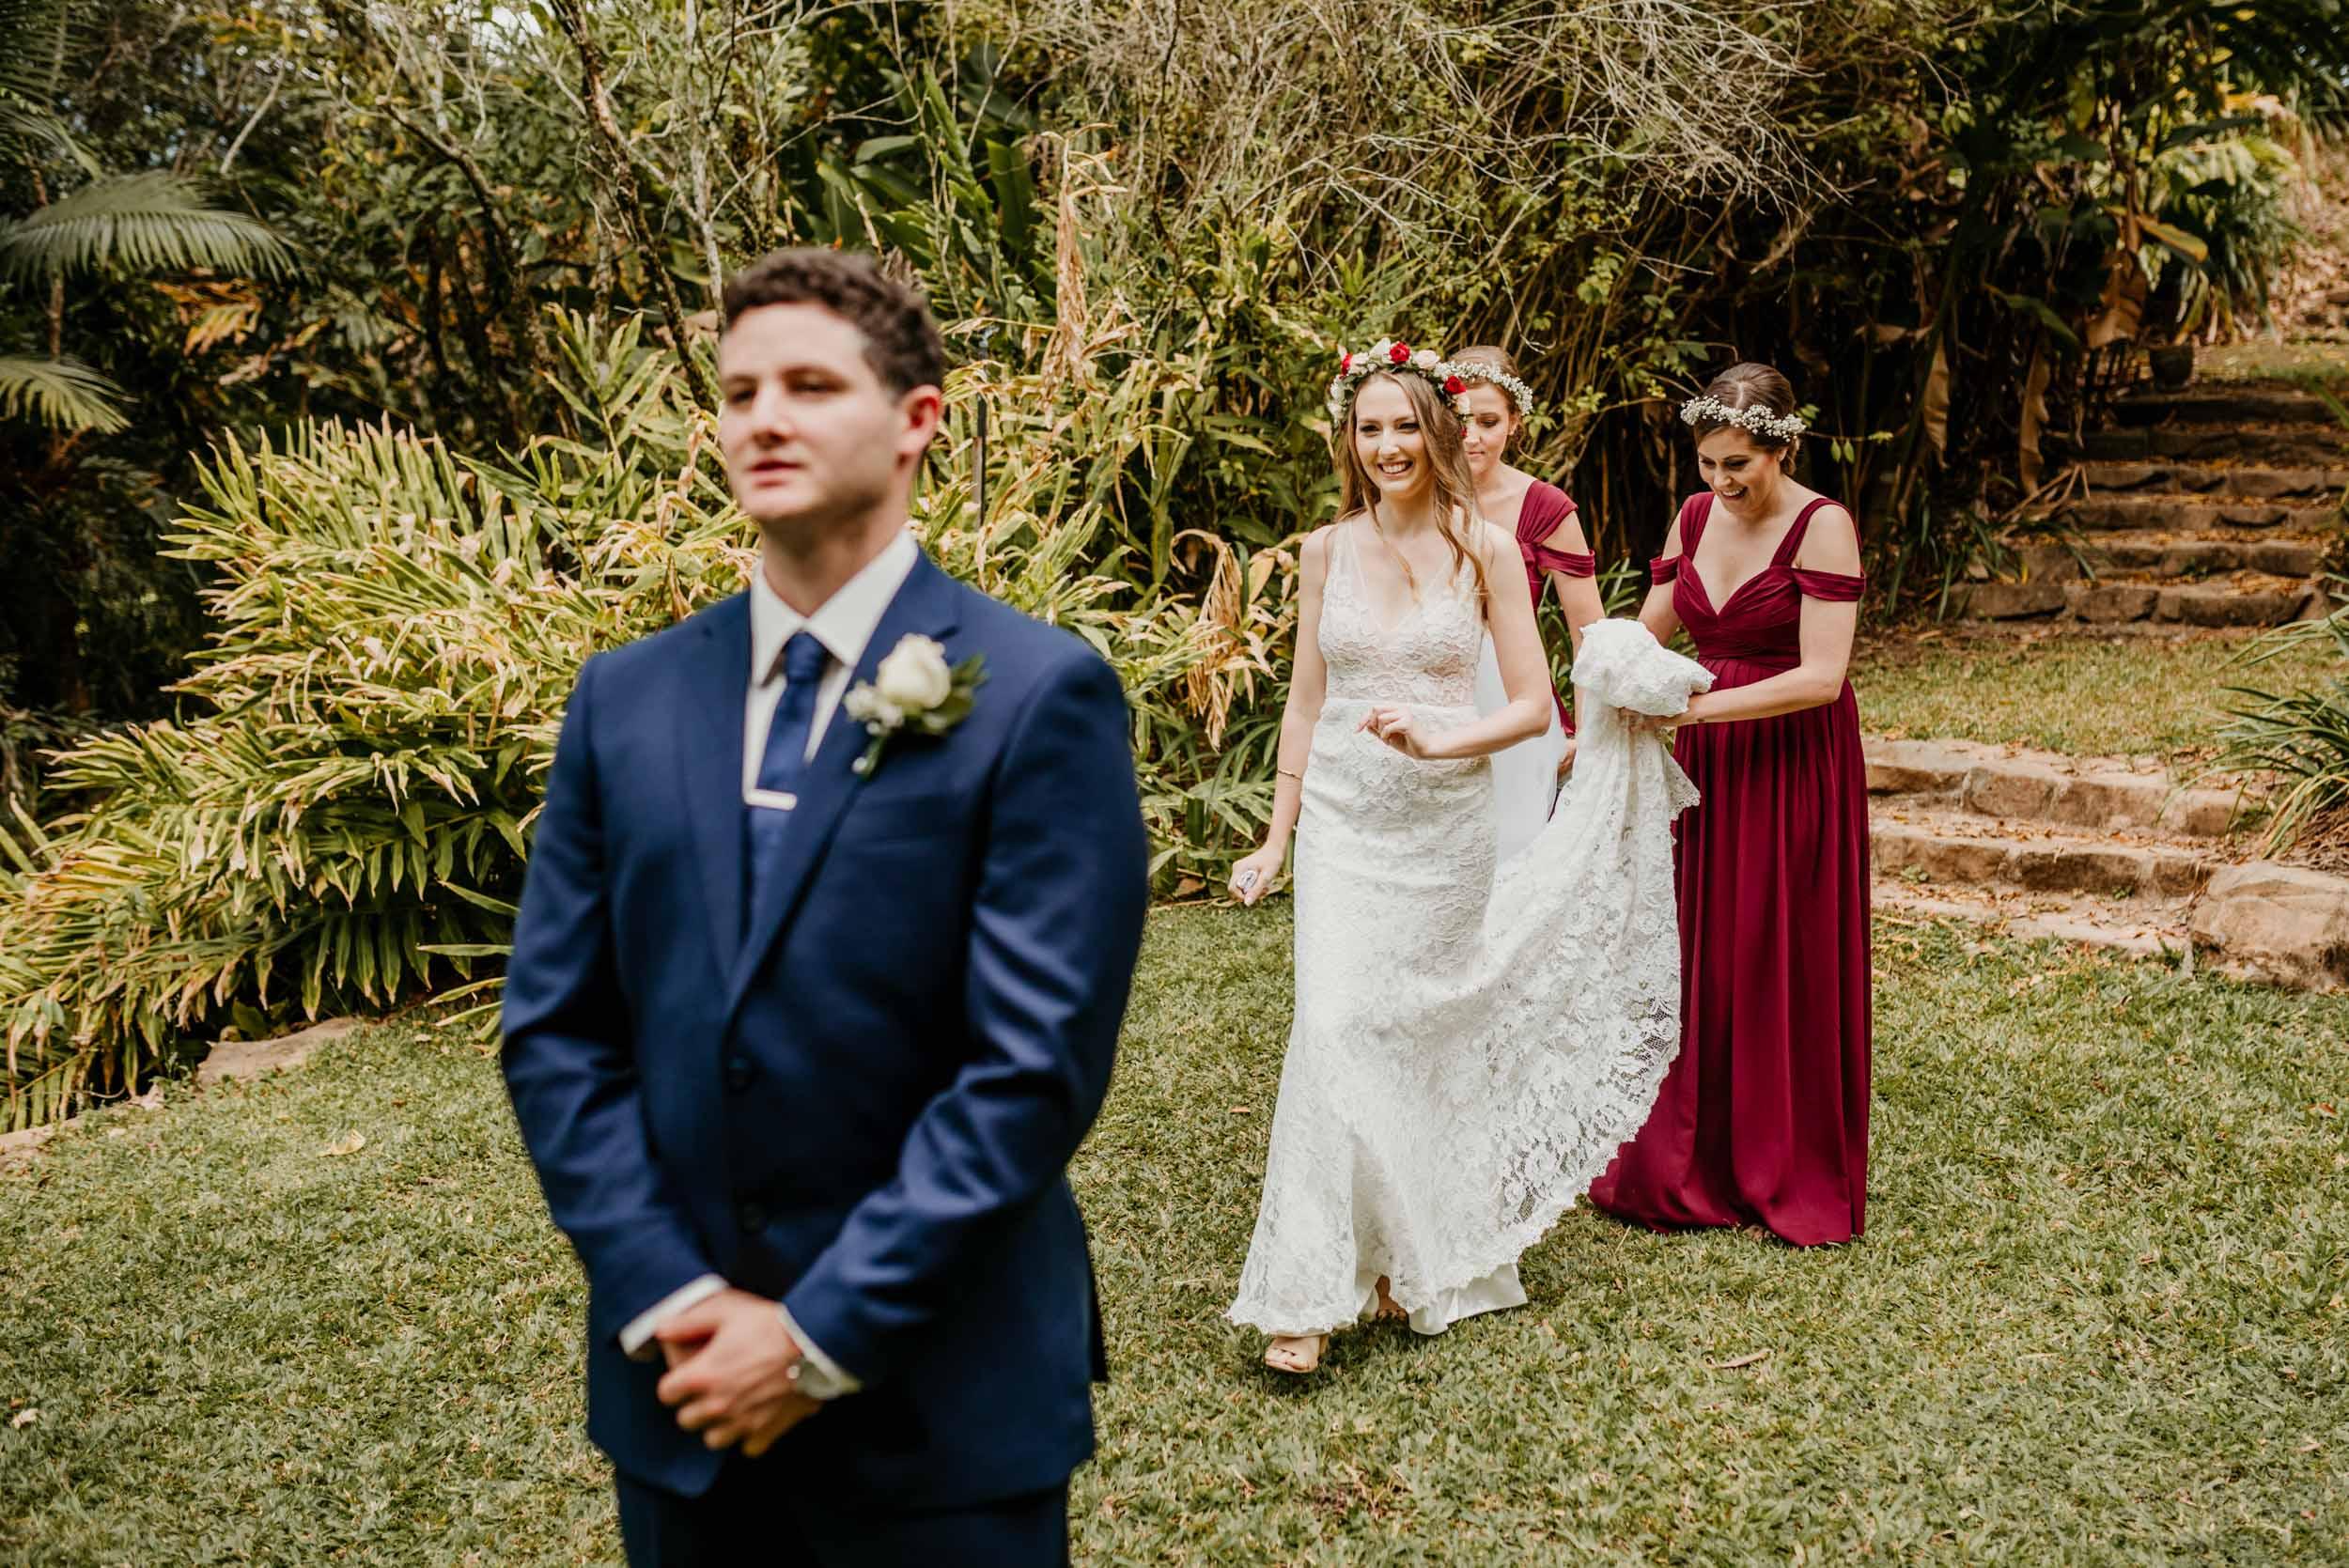 The Raw Photographer - Cairns Wedding Photographer - Laloli - Cairns Garden Ceremony - Cane Fields Photo Shoot-24.jpg